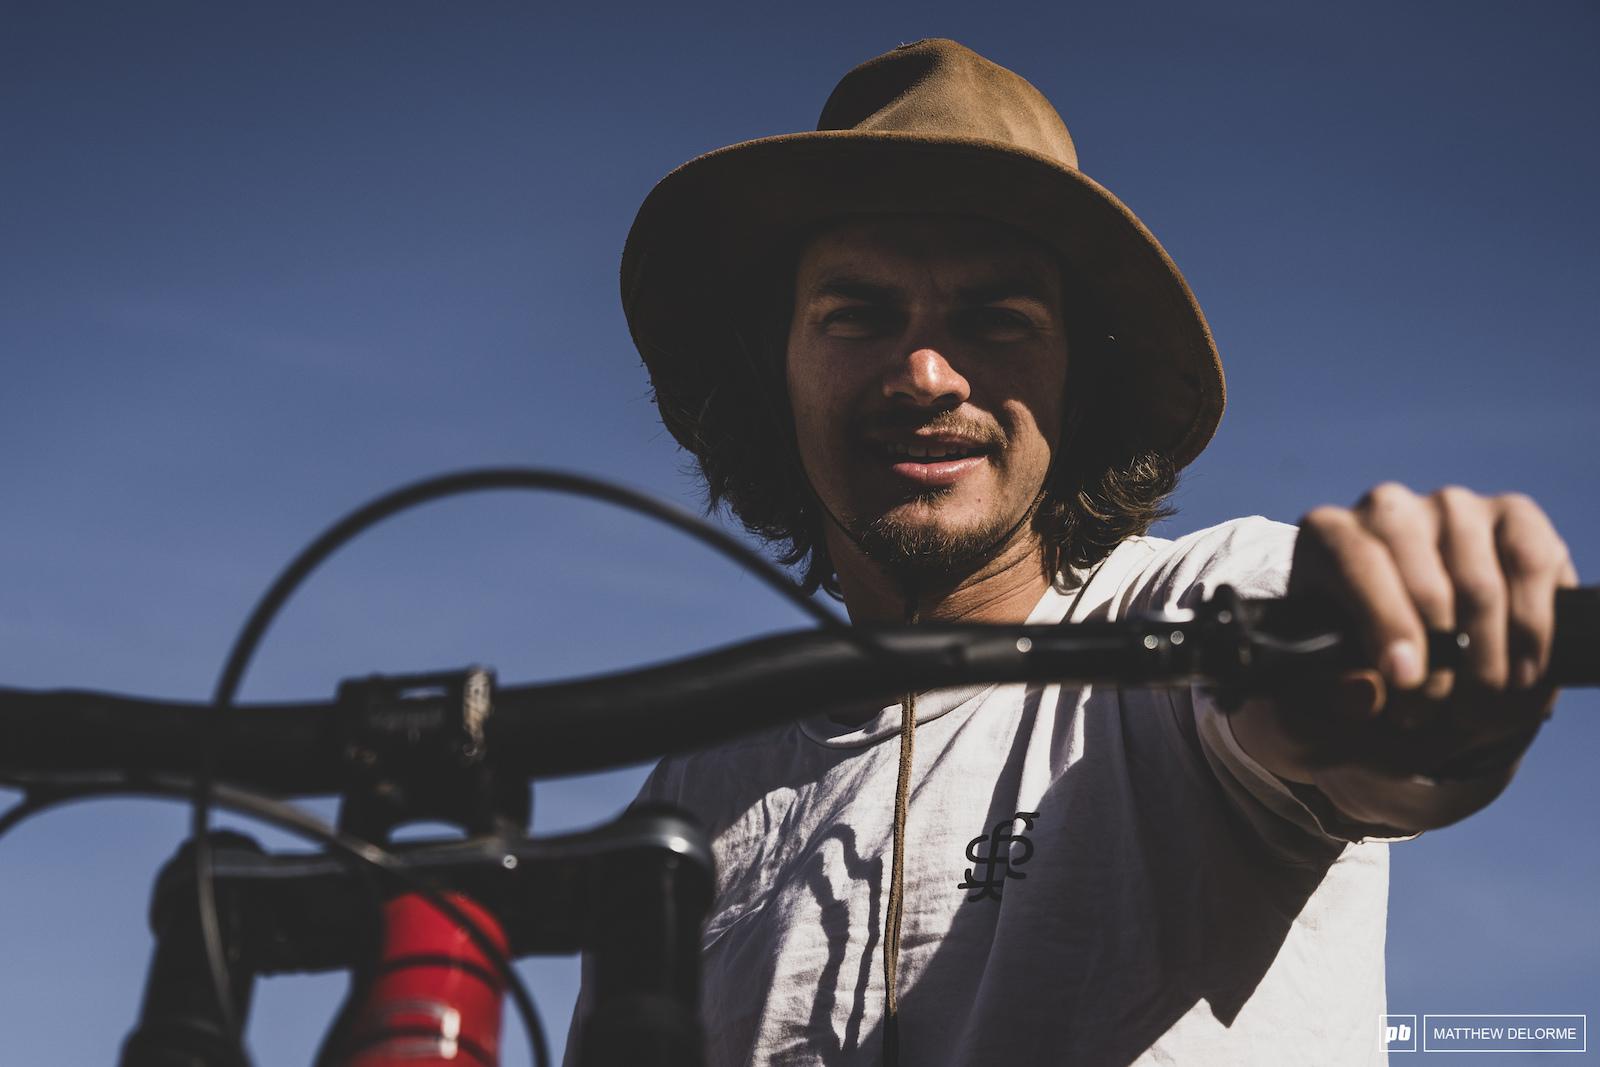 Mitch Ropelatto was on sherpa duty today.